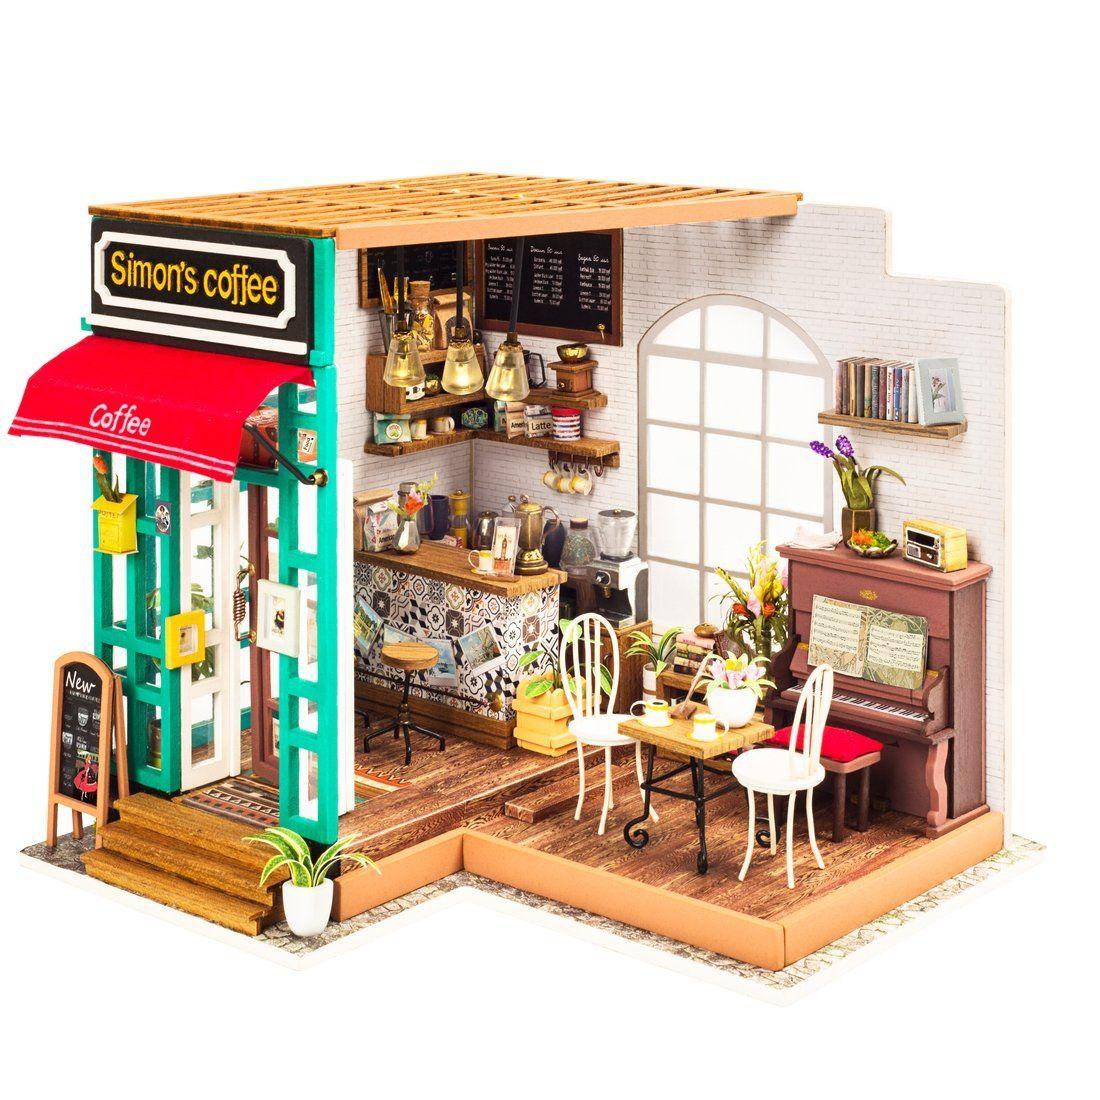 Photo of Miniature DIY House Kits – Simon's Coffee Shop